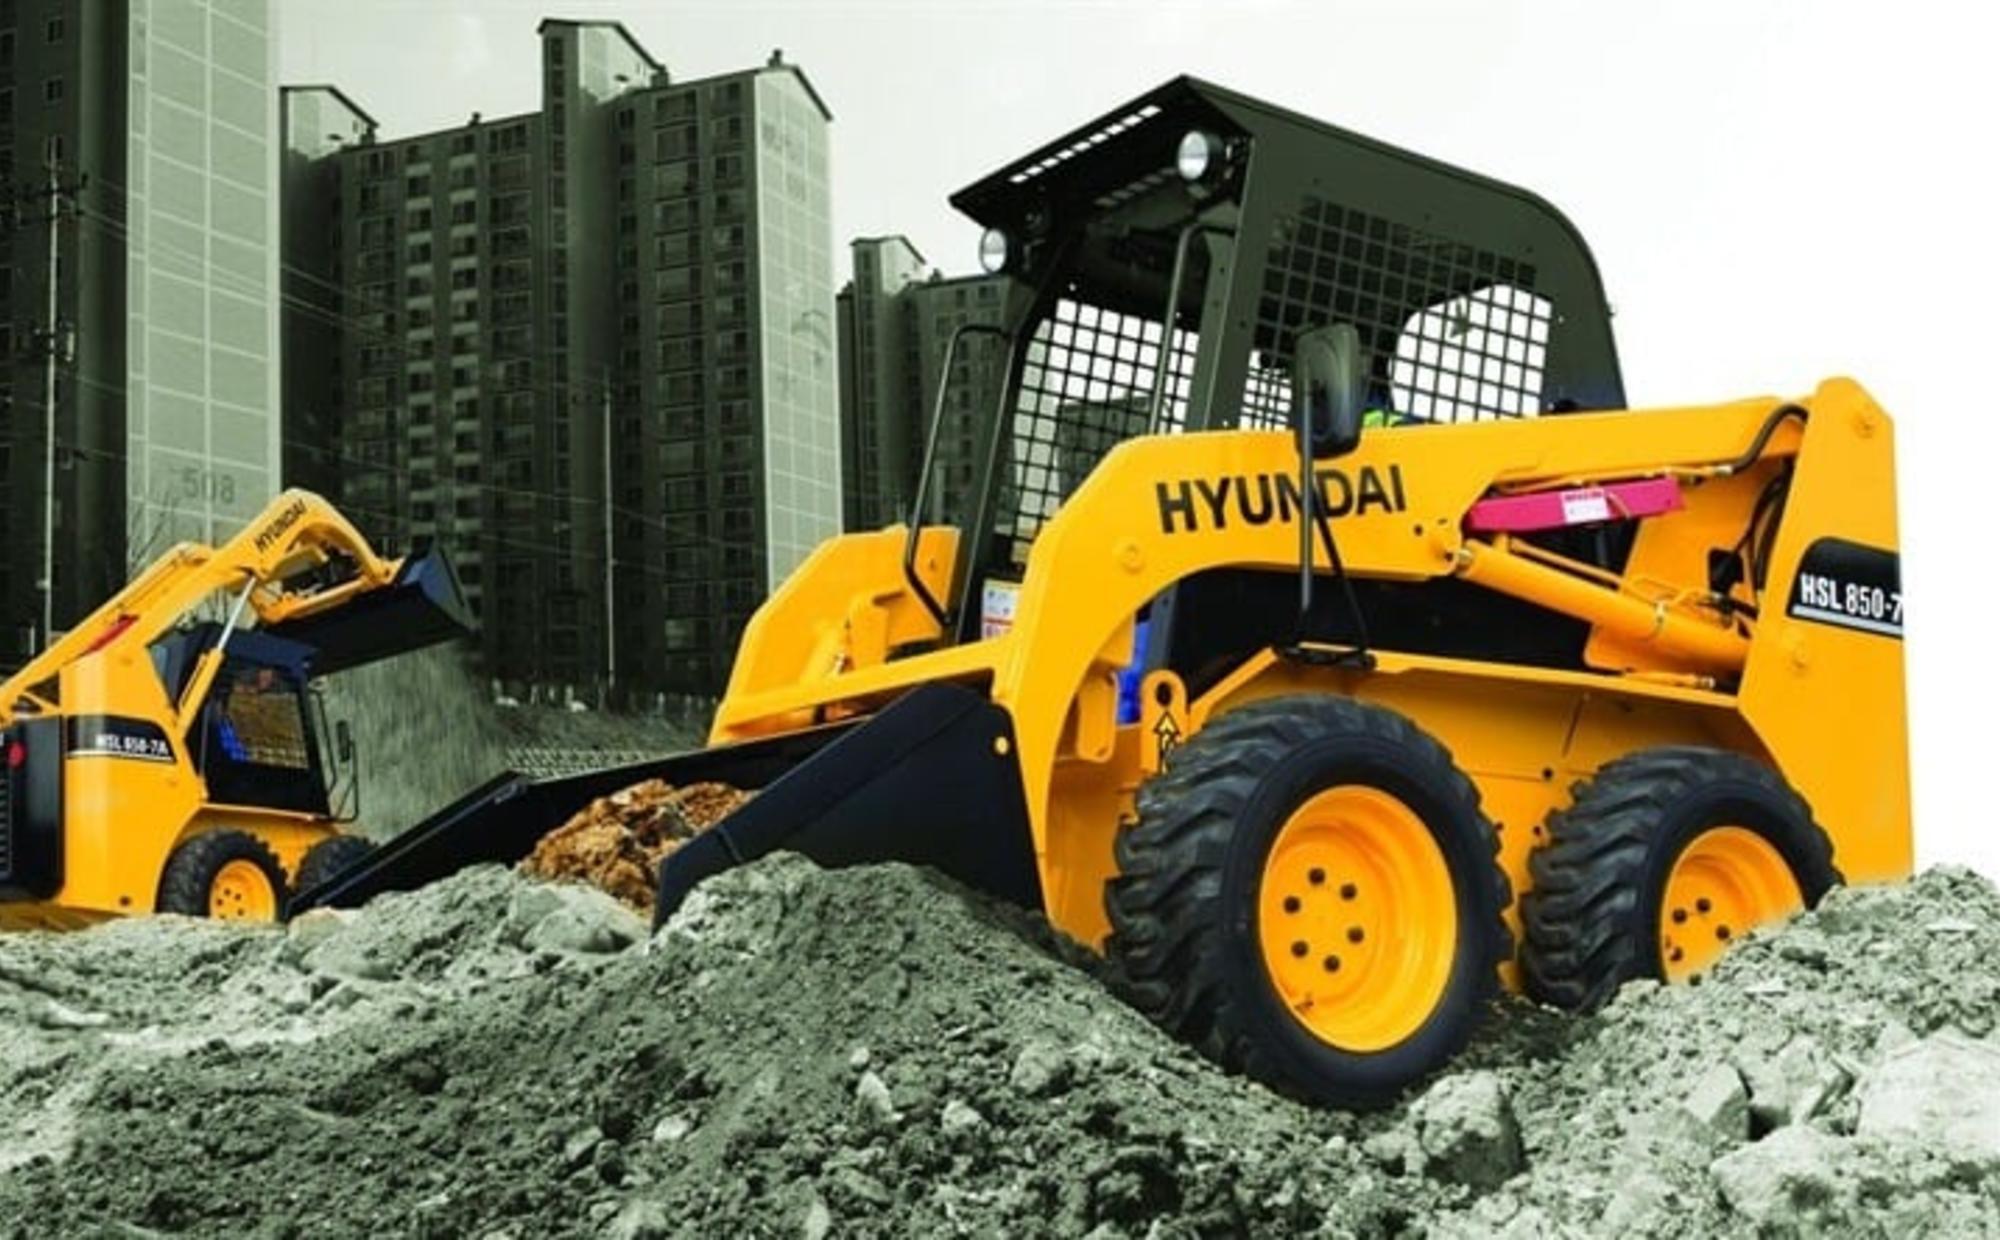 Аренда мини-погрузчика Hyundai HSL 650-7